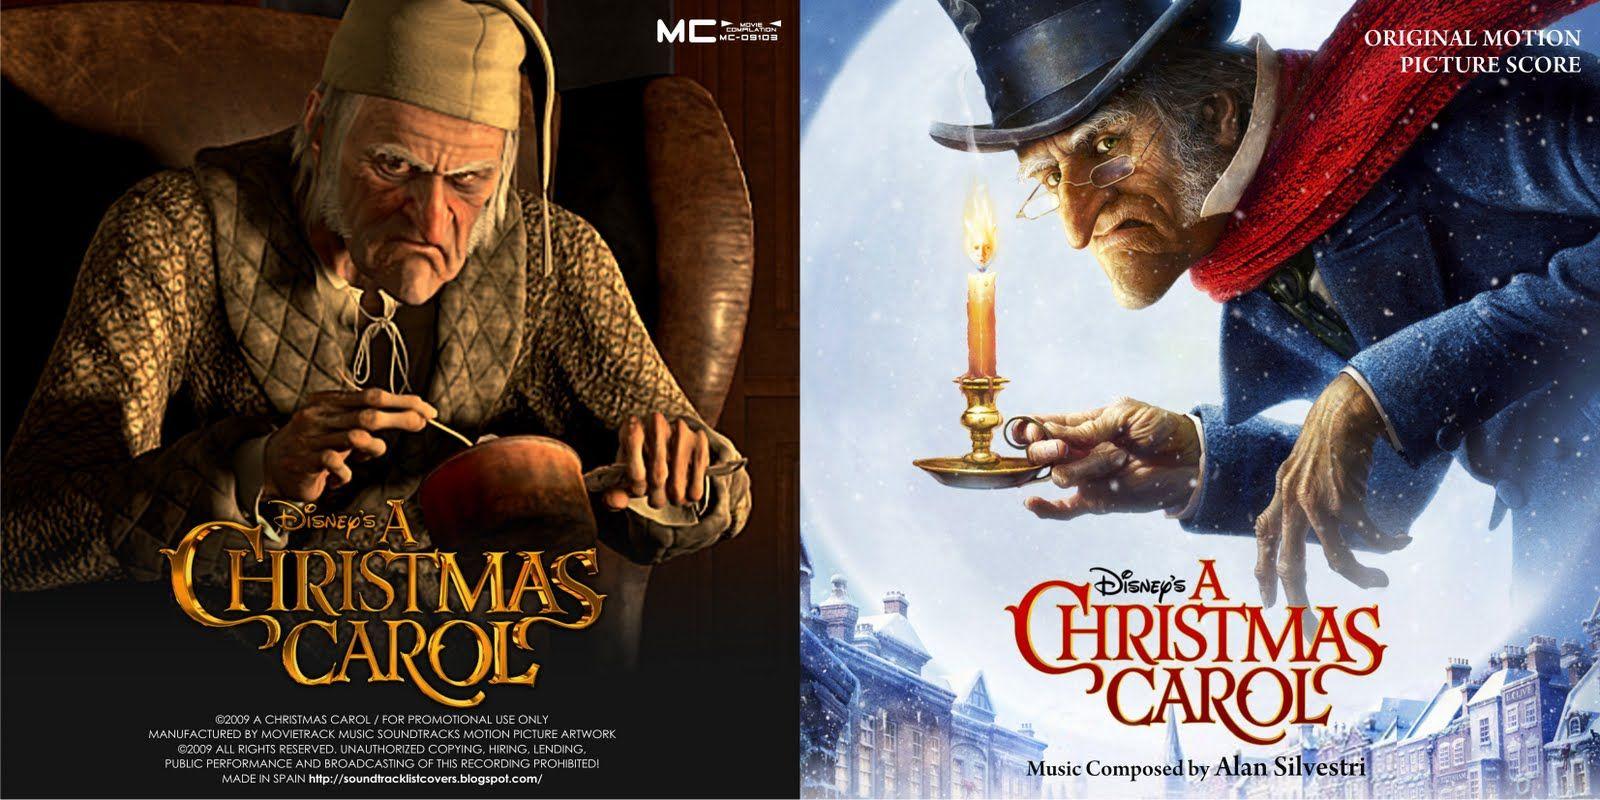 A Christmas Carol Soundtrack.Soundtrack List Covers A Christmas Carol Alan Silvestri Scrooge